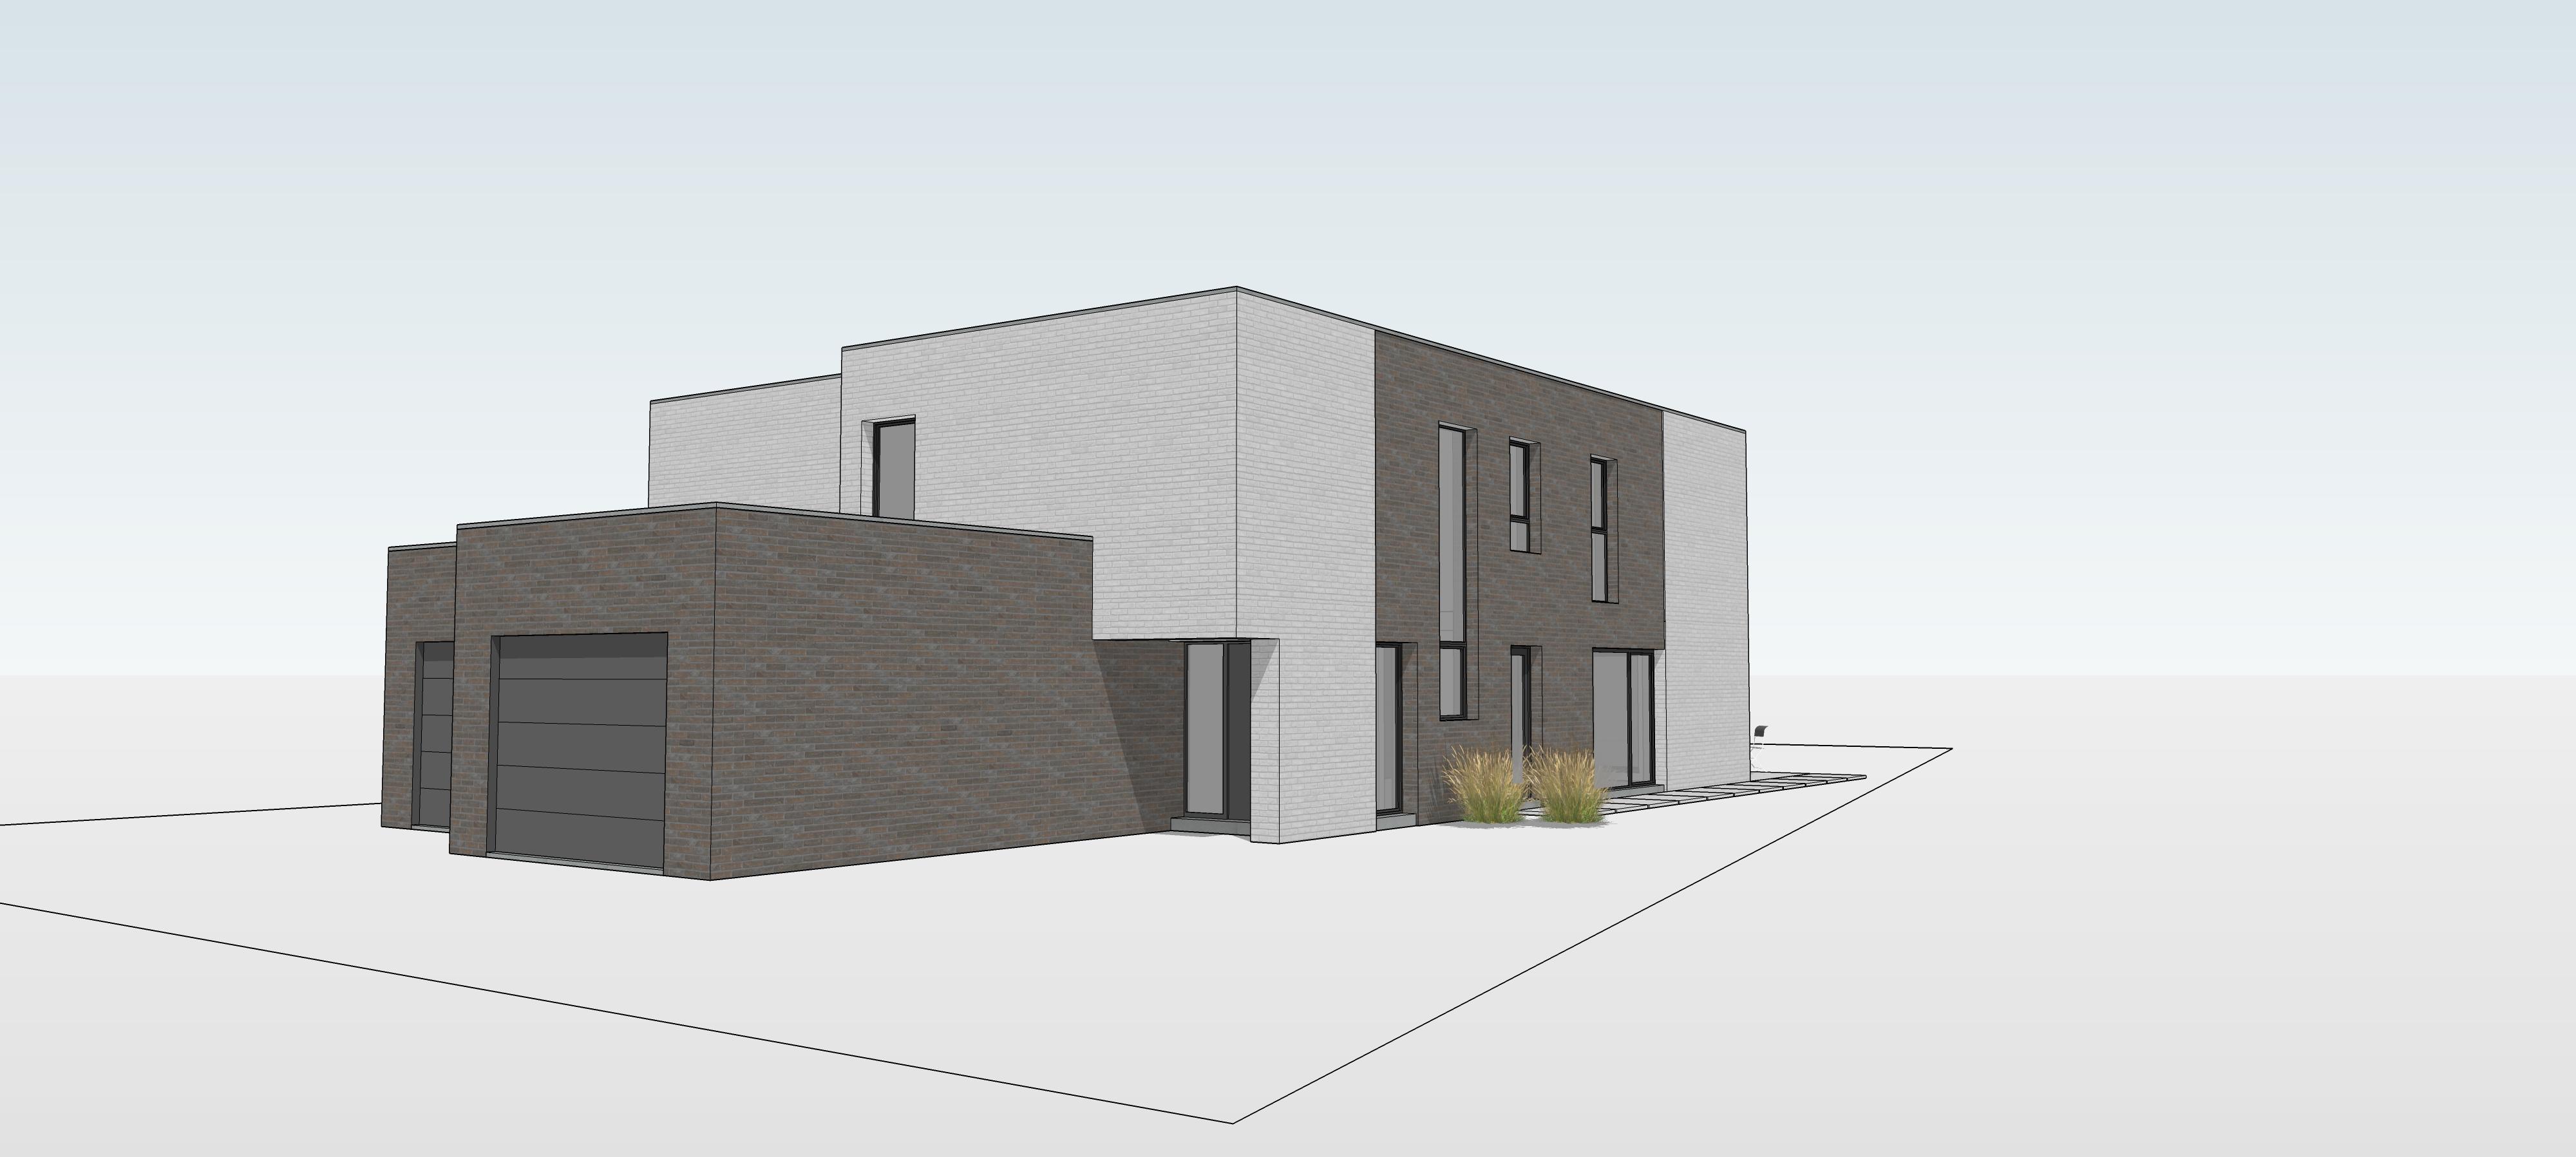 facade maison gris clair facade maison gris clair facade maison gris clair couleur crepi. Black Bedroom Furniture Sets. Home Design Ideas